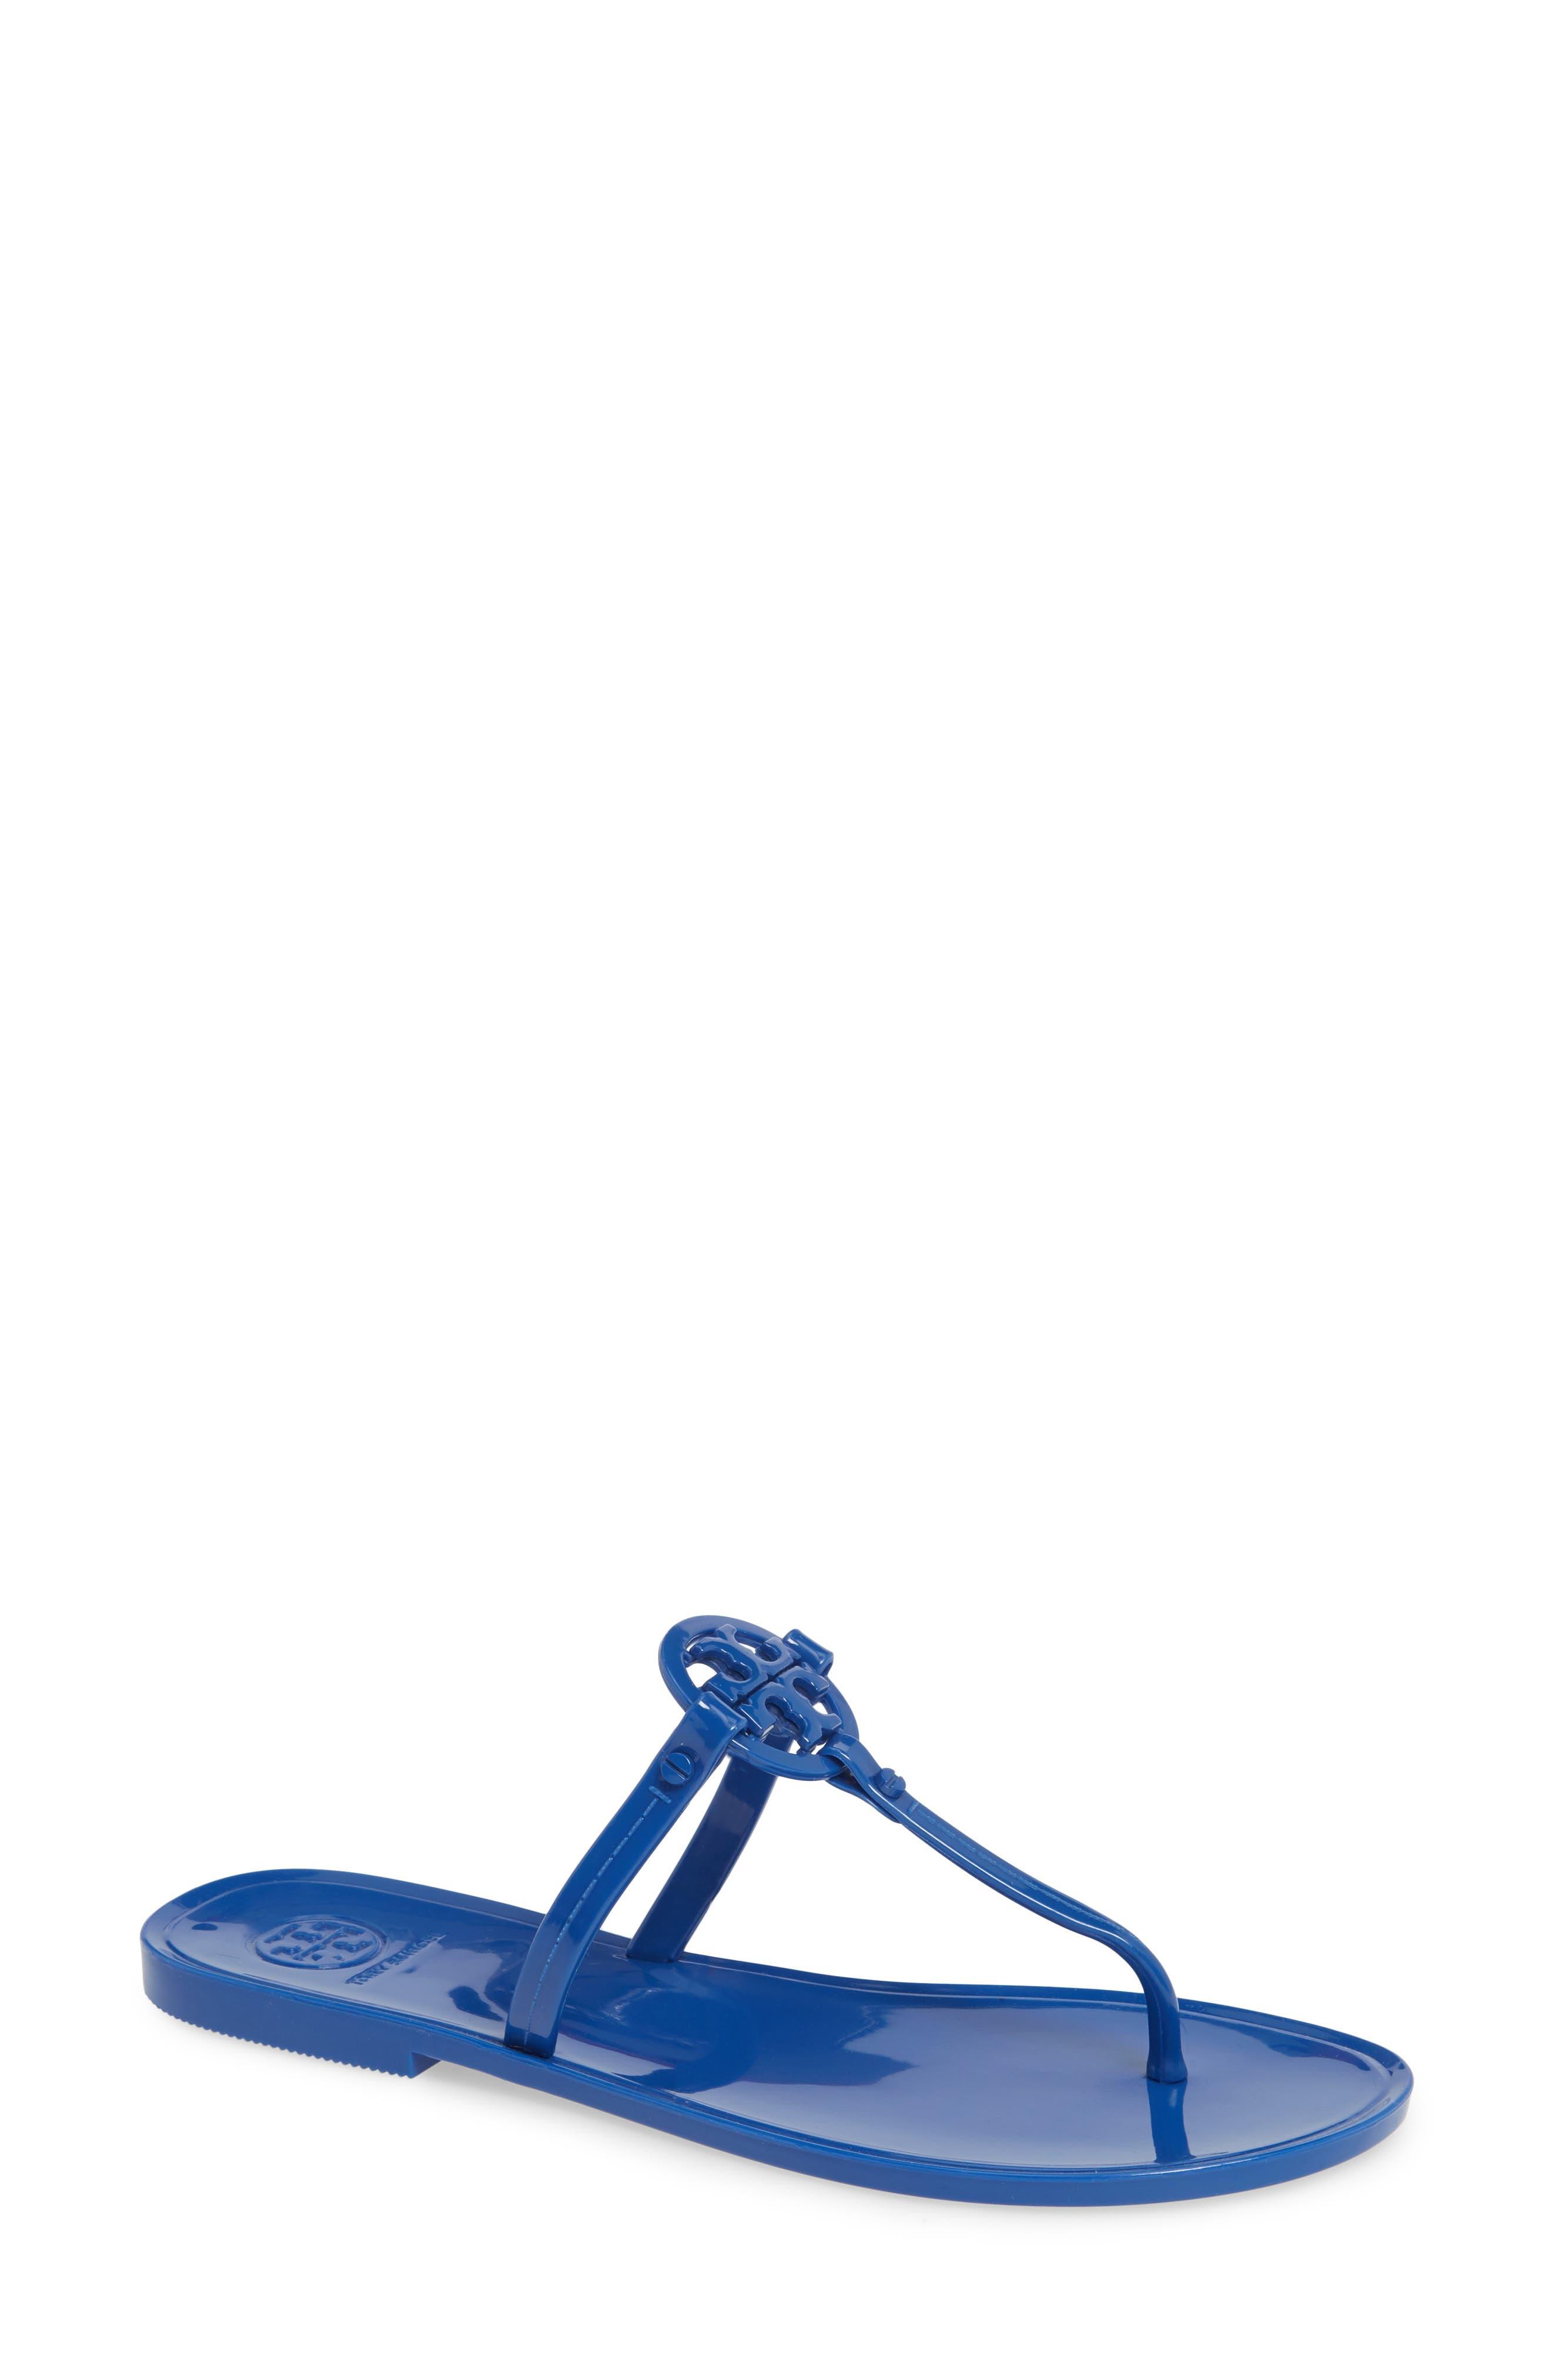 4b86d71795c Tory Burch  Mini Miller  Flat Sandal